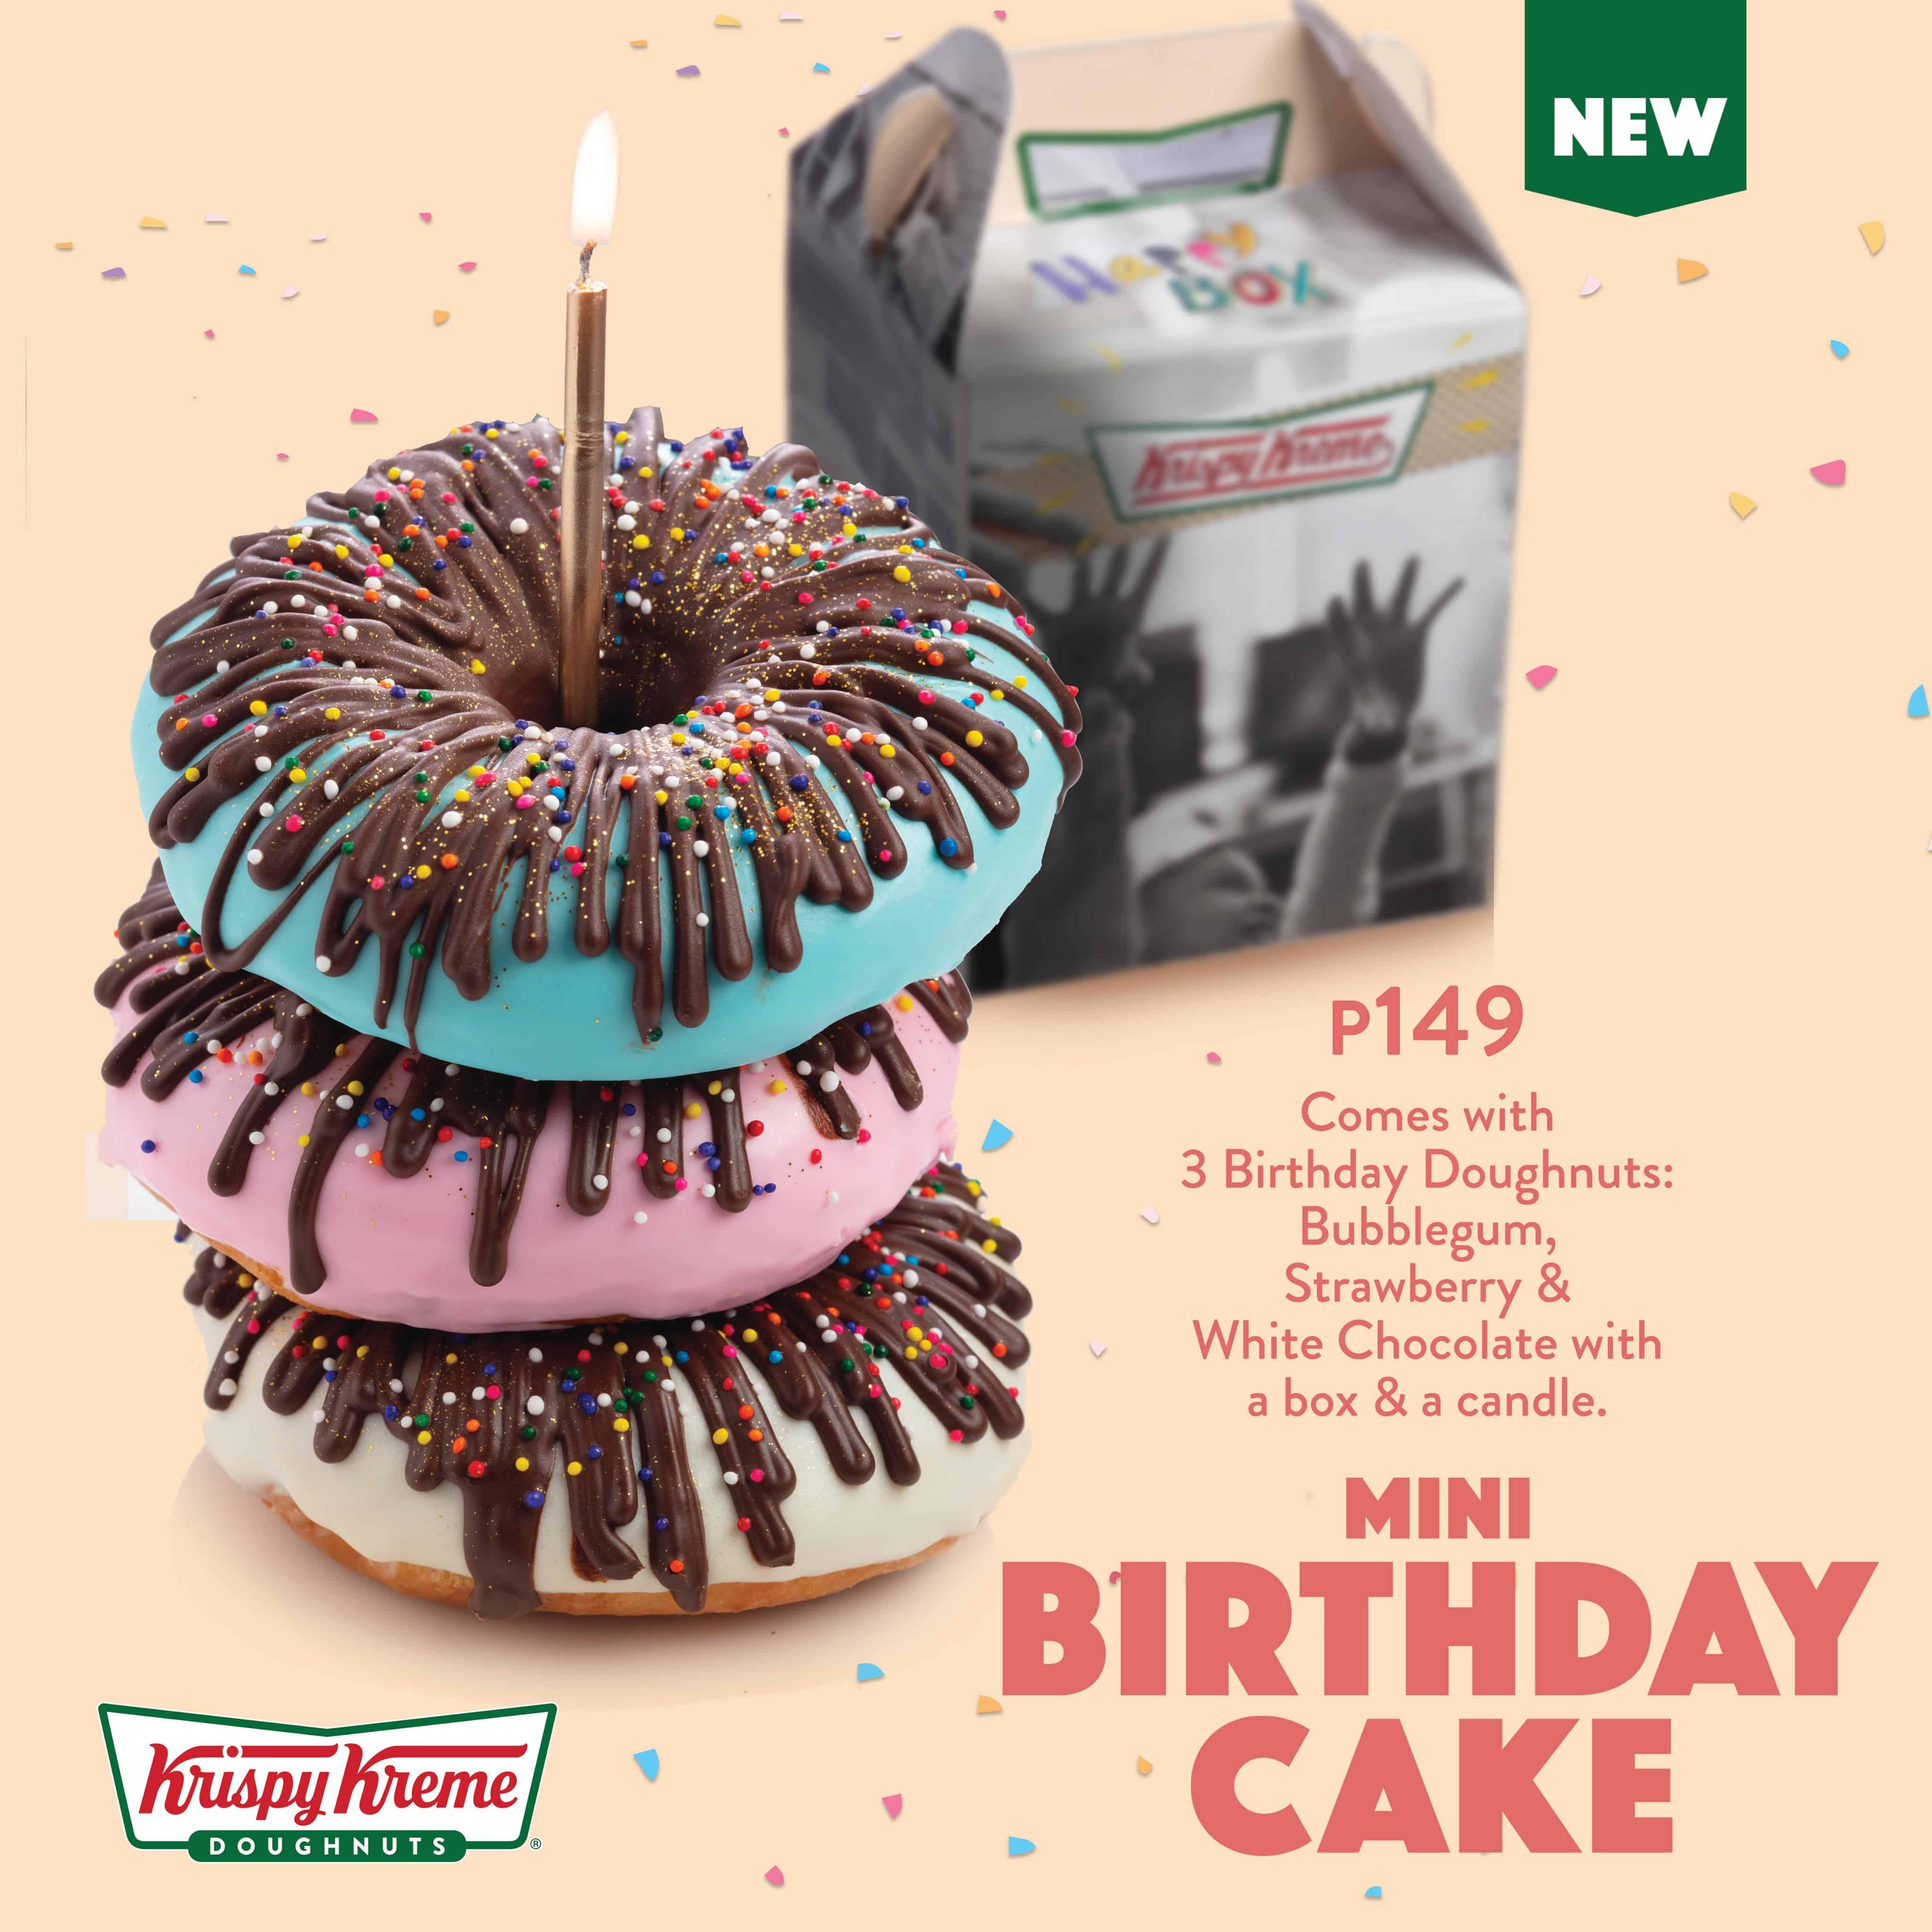 Marvelous Happy Birthday Krispy Kreme With Mini Birthday Cake Doughnuts Funny Birthday Cards Online Alyptdamsfinfo